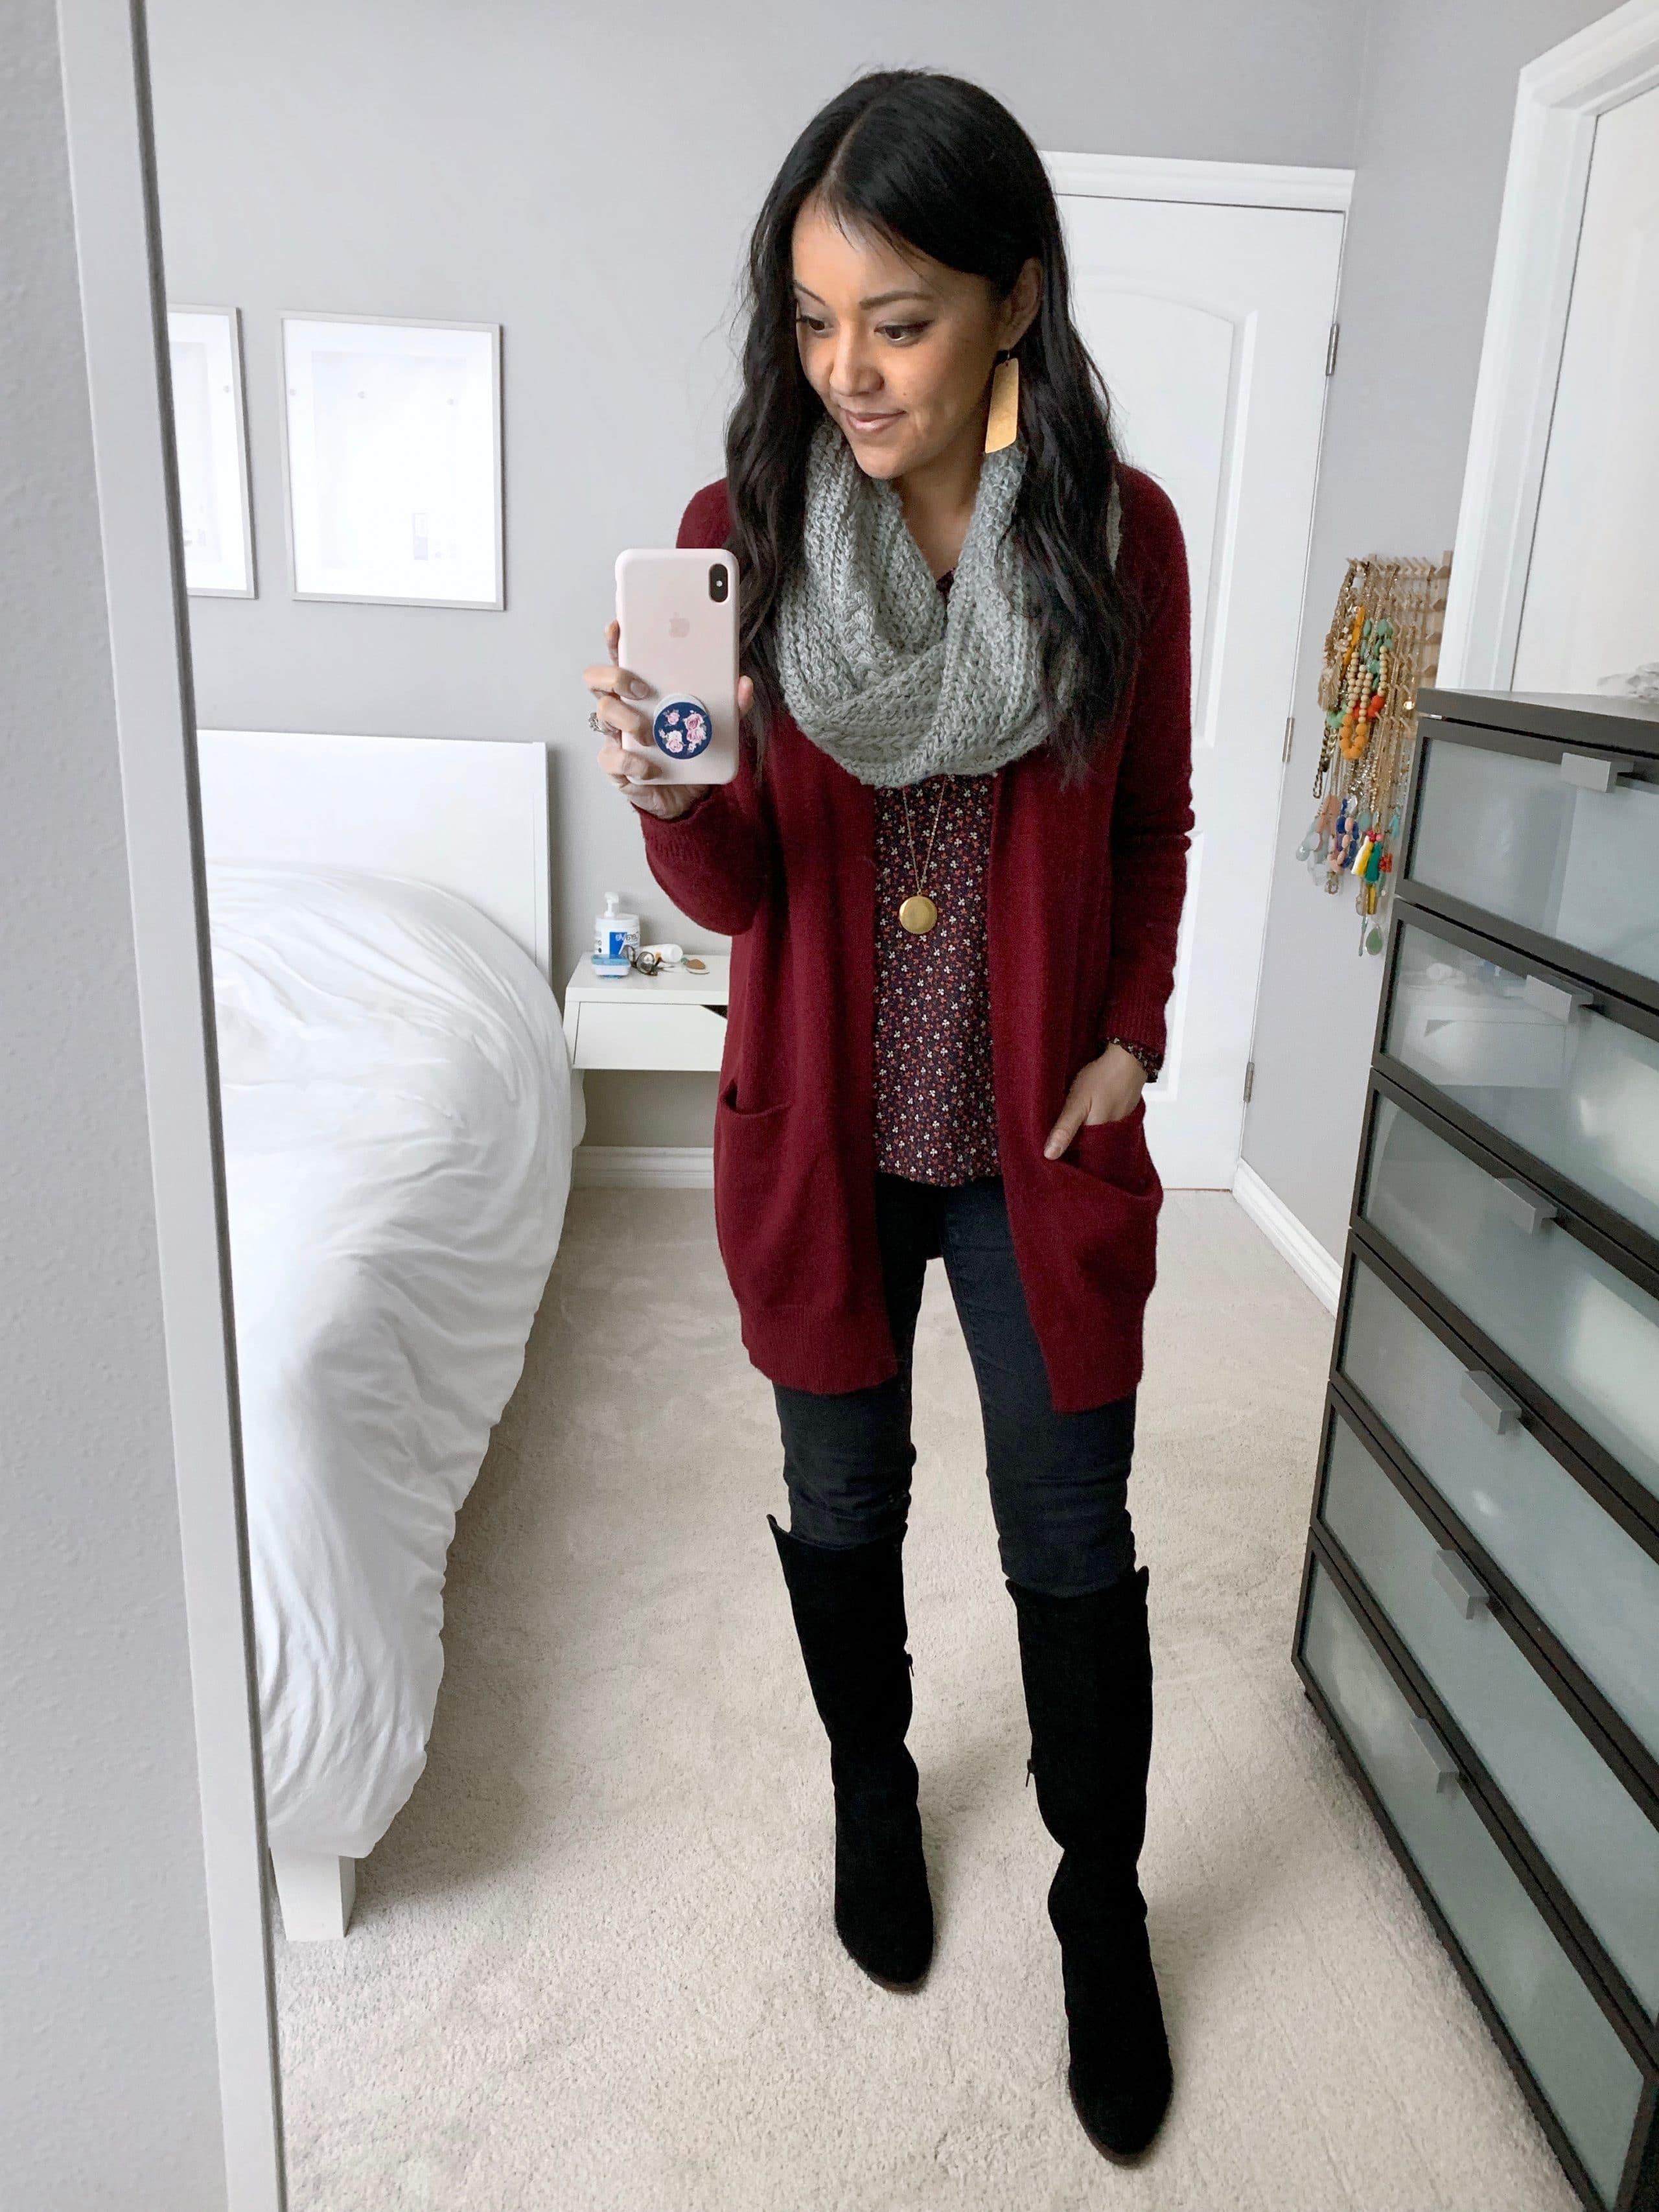 maroon cardigan + black jeans + black boots